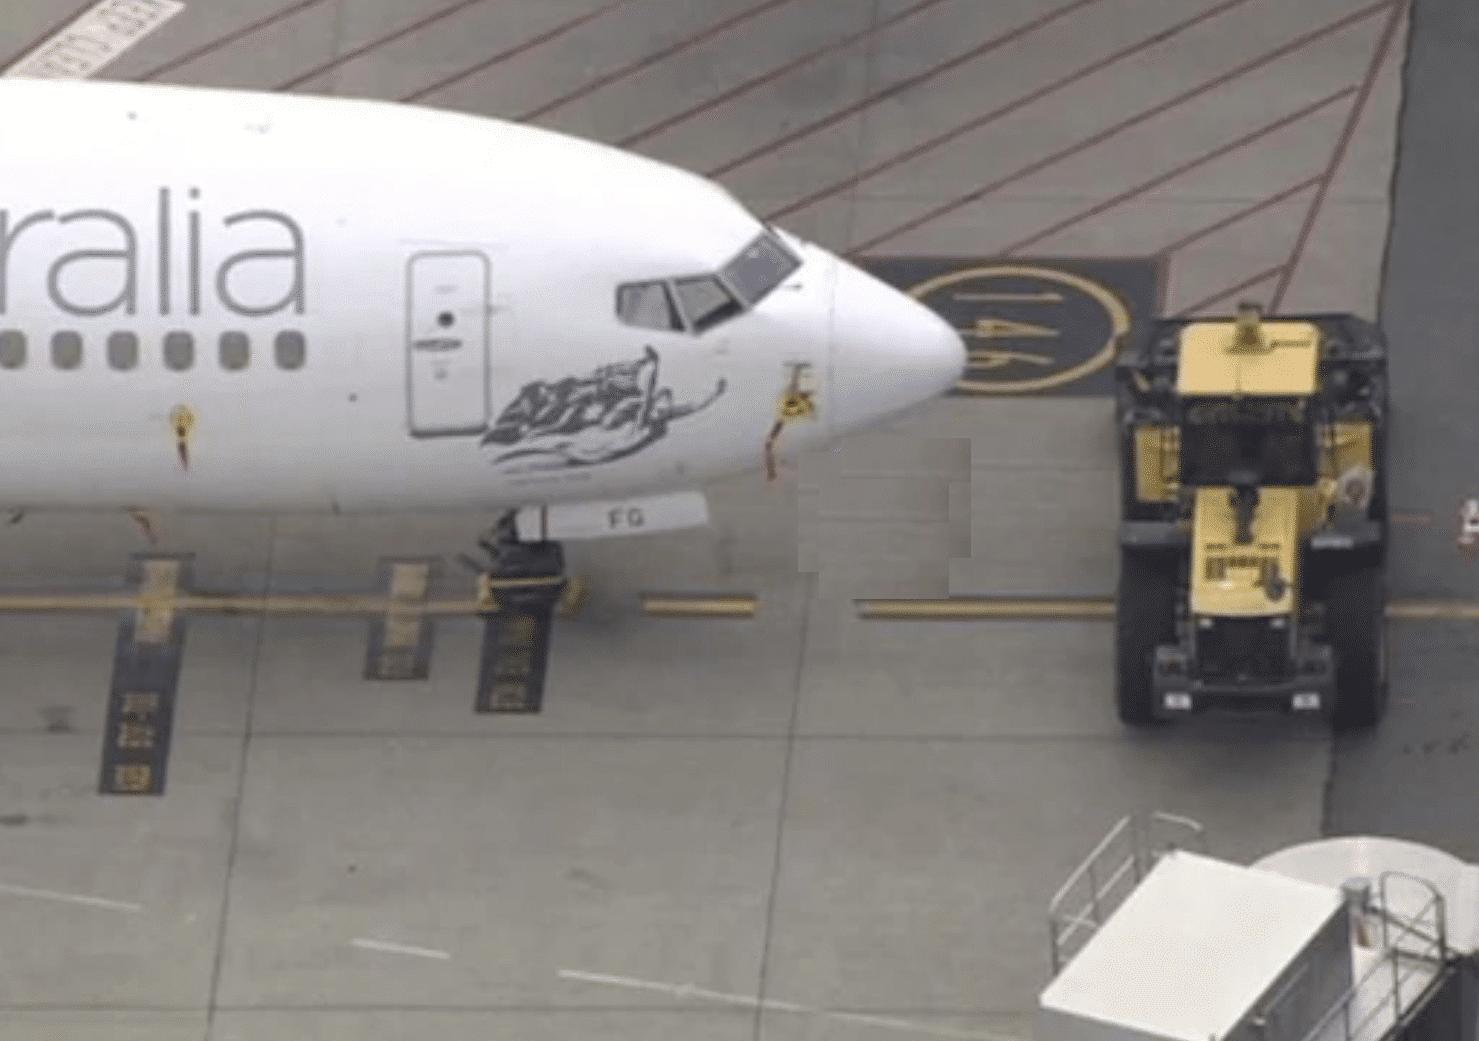 Bulldozer blocks Virgin Australia plane